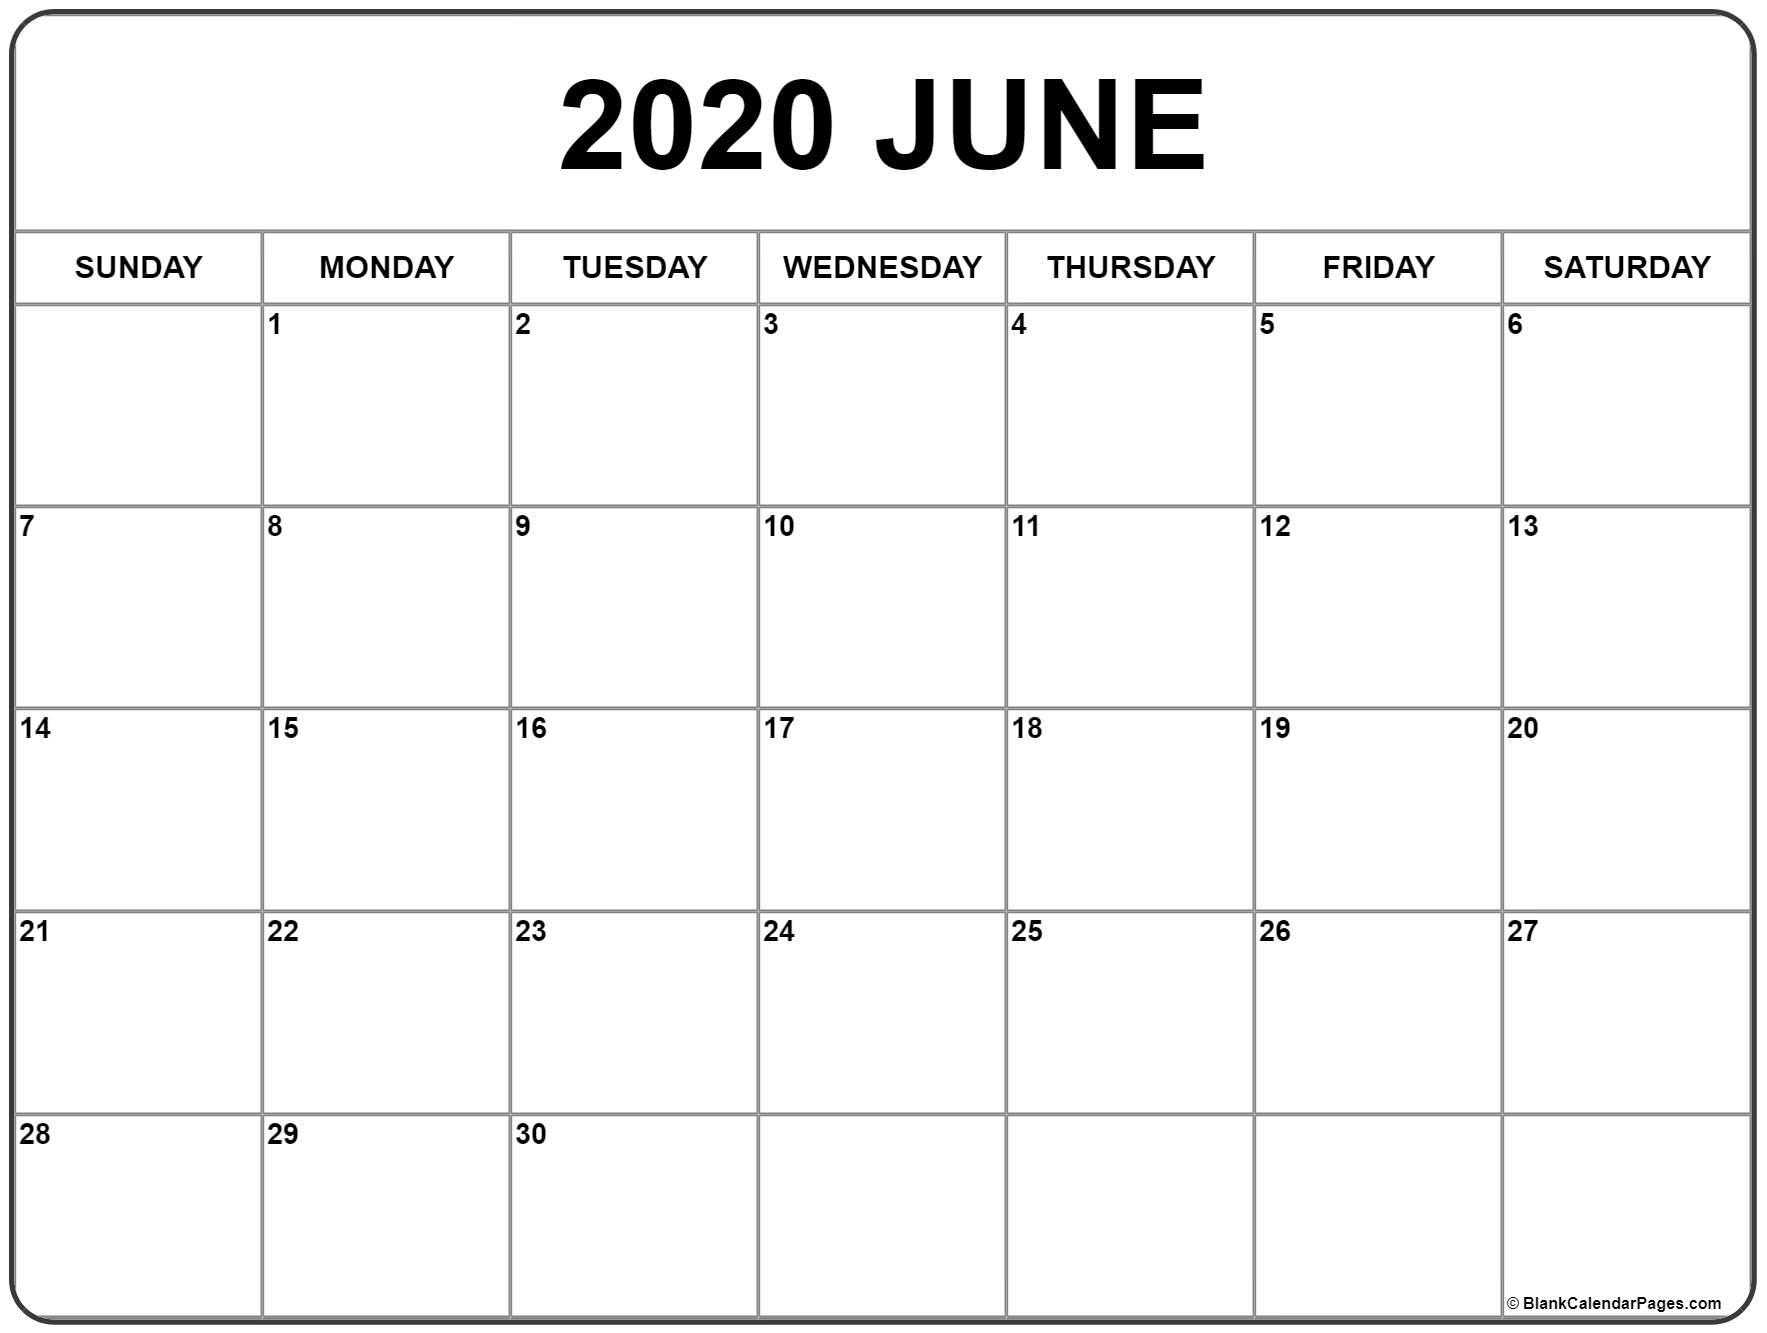 Get Free Blank Calendar Printable